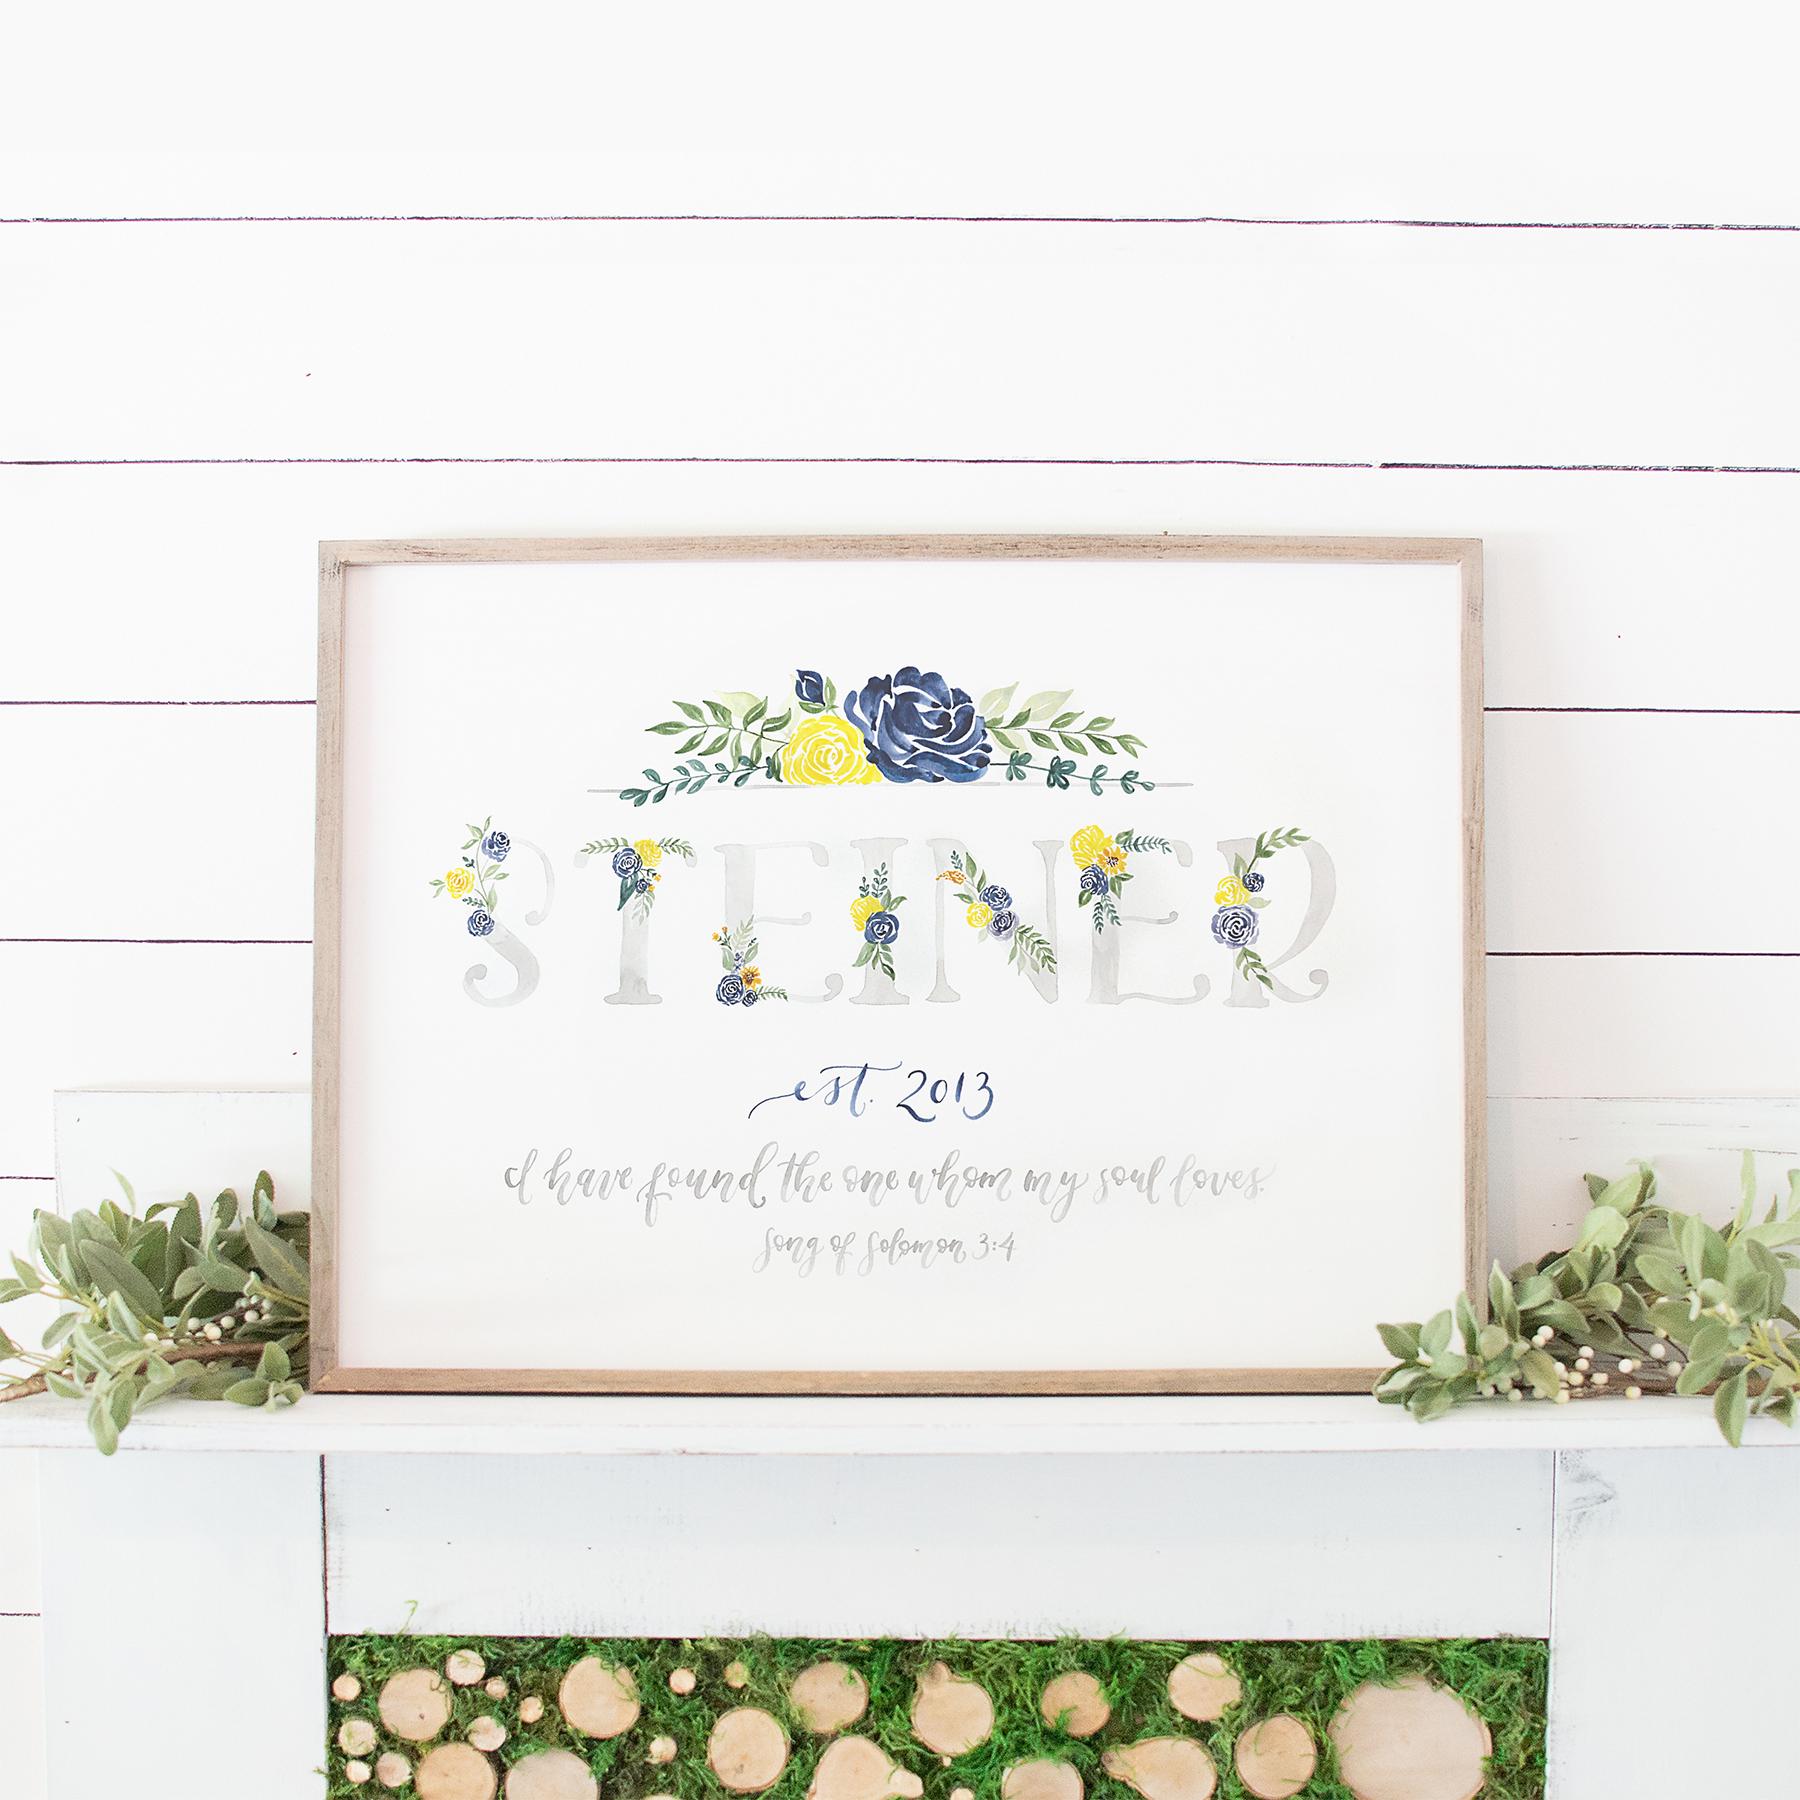 Sam Allen Creates Watercolor Floral Family Name Sign